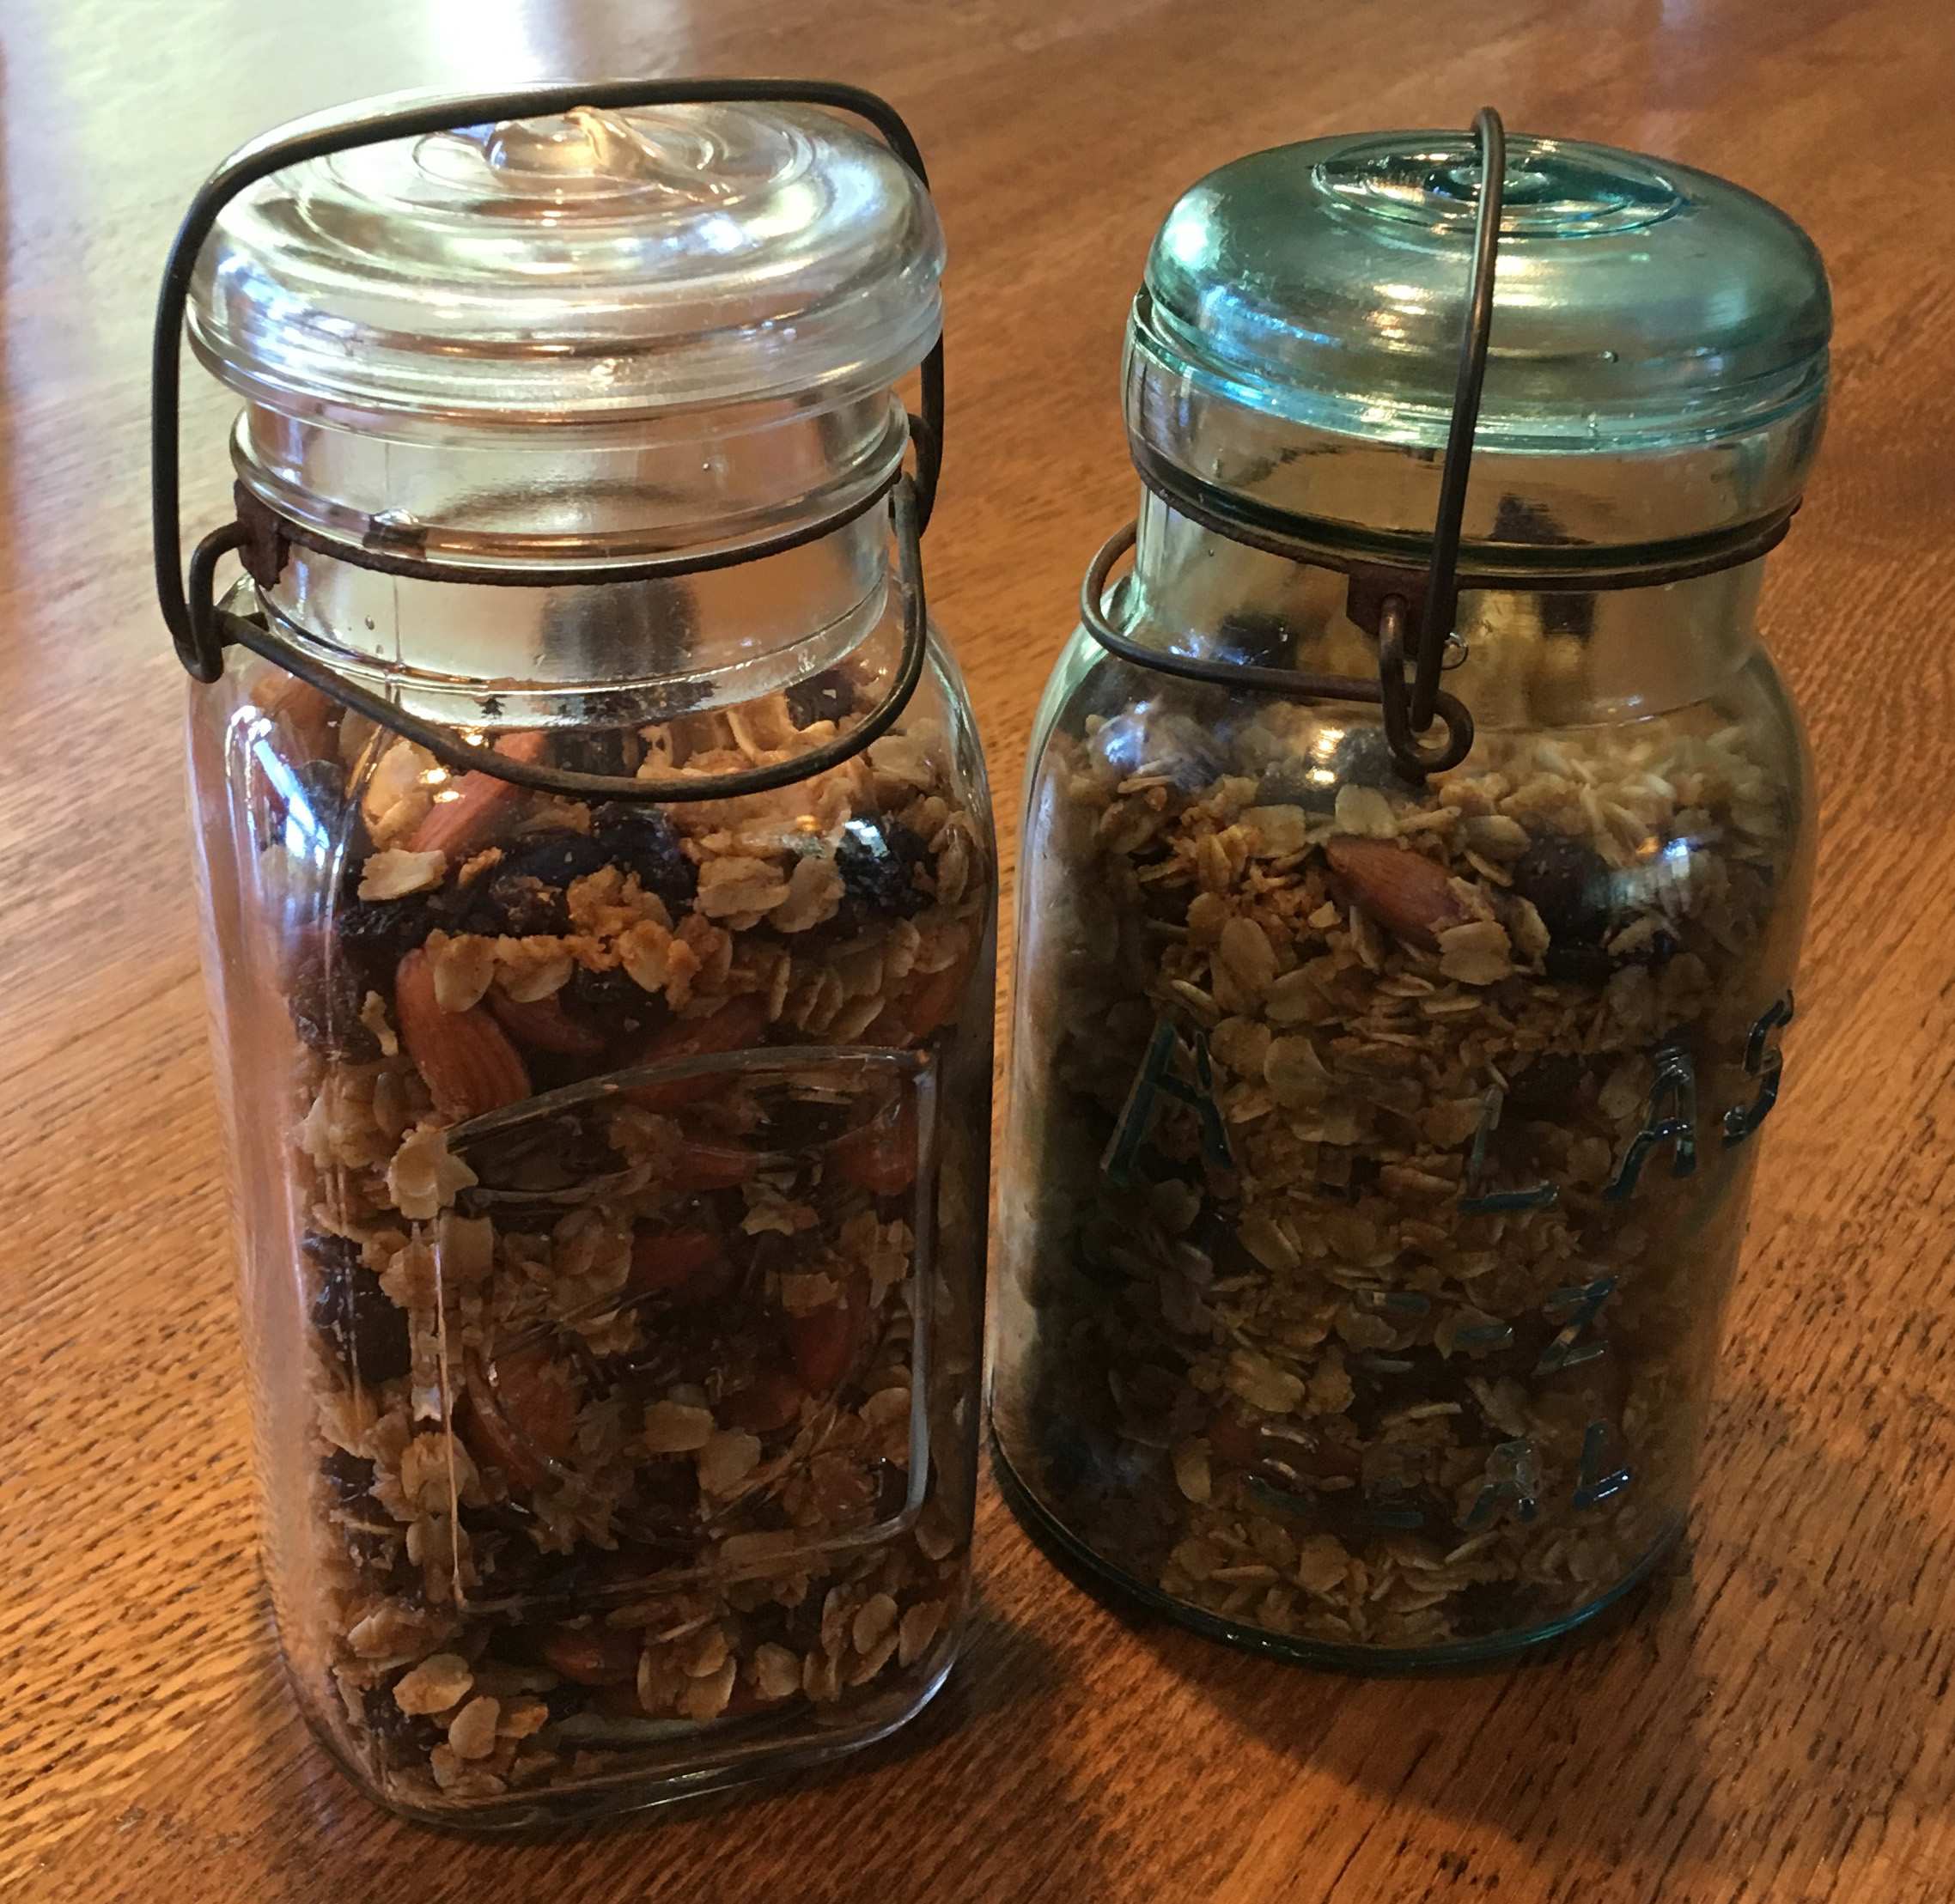 Toasted Almond Granola - Homemade, Vegan, and Gluten Free and often served with Fresh Organic Berries and Organic Greek Yogurt